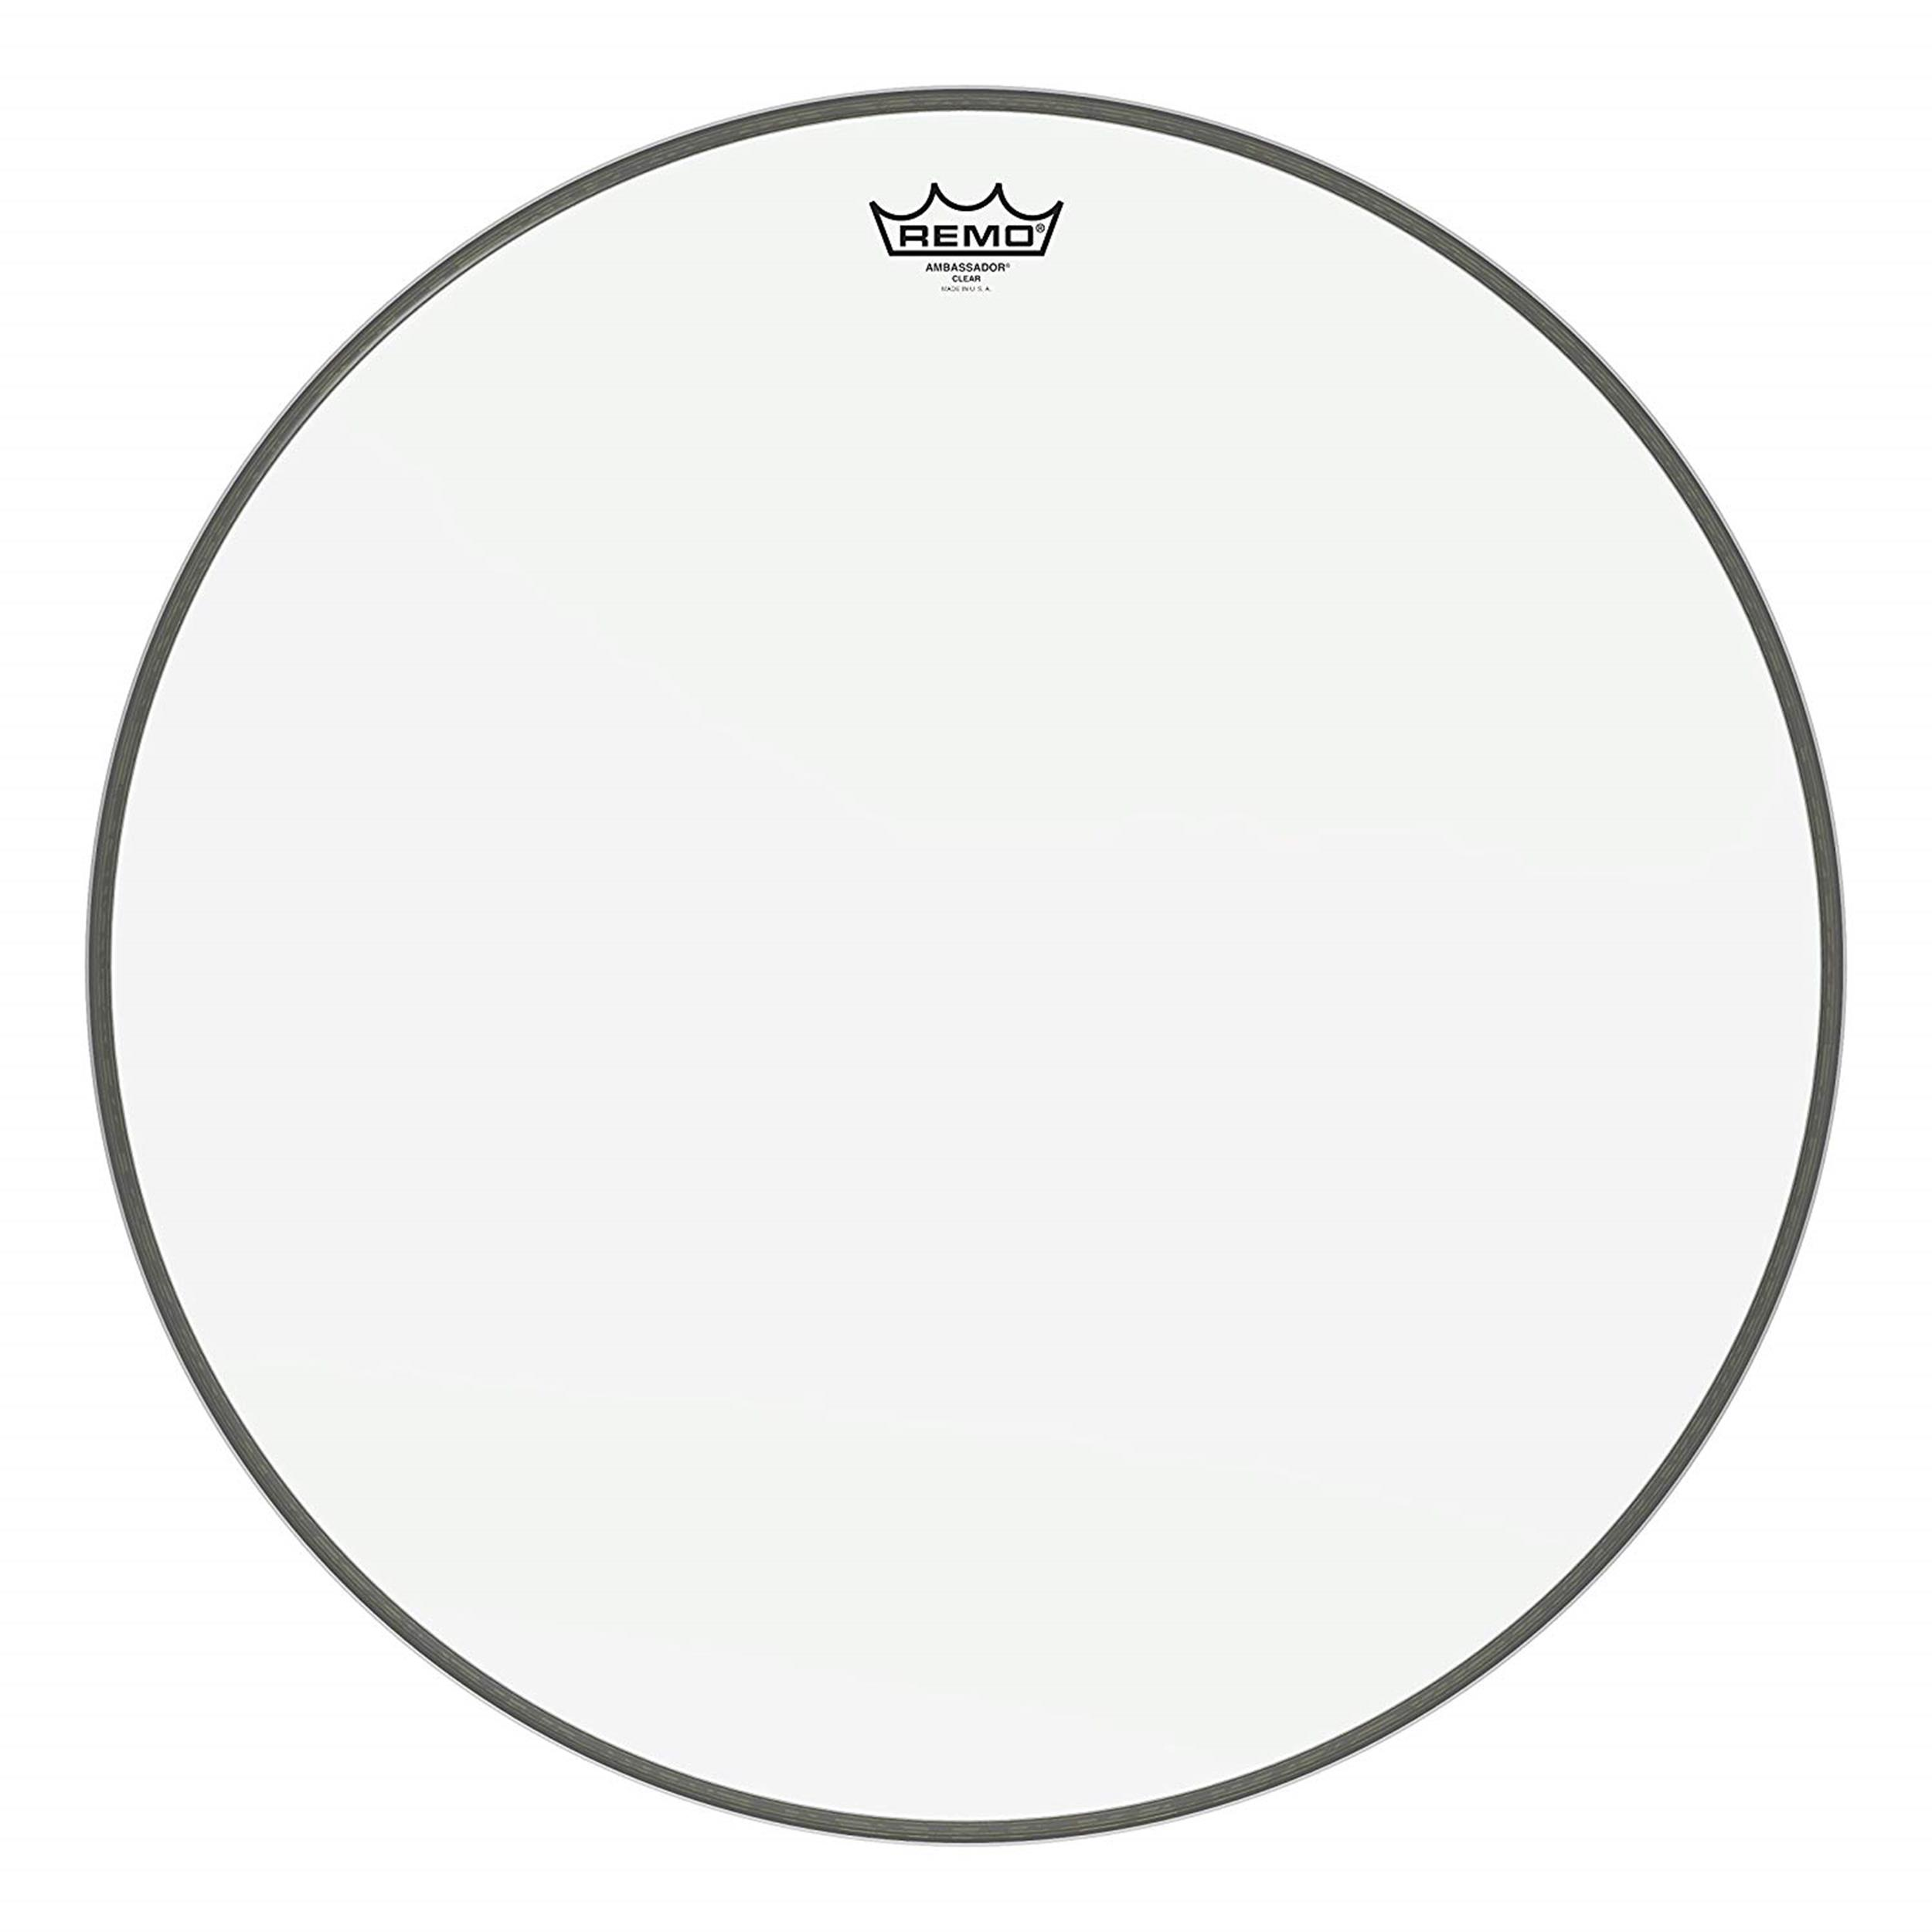 REMO-AMBASSADOR-CLEAR-22-sku-6928